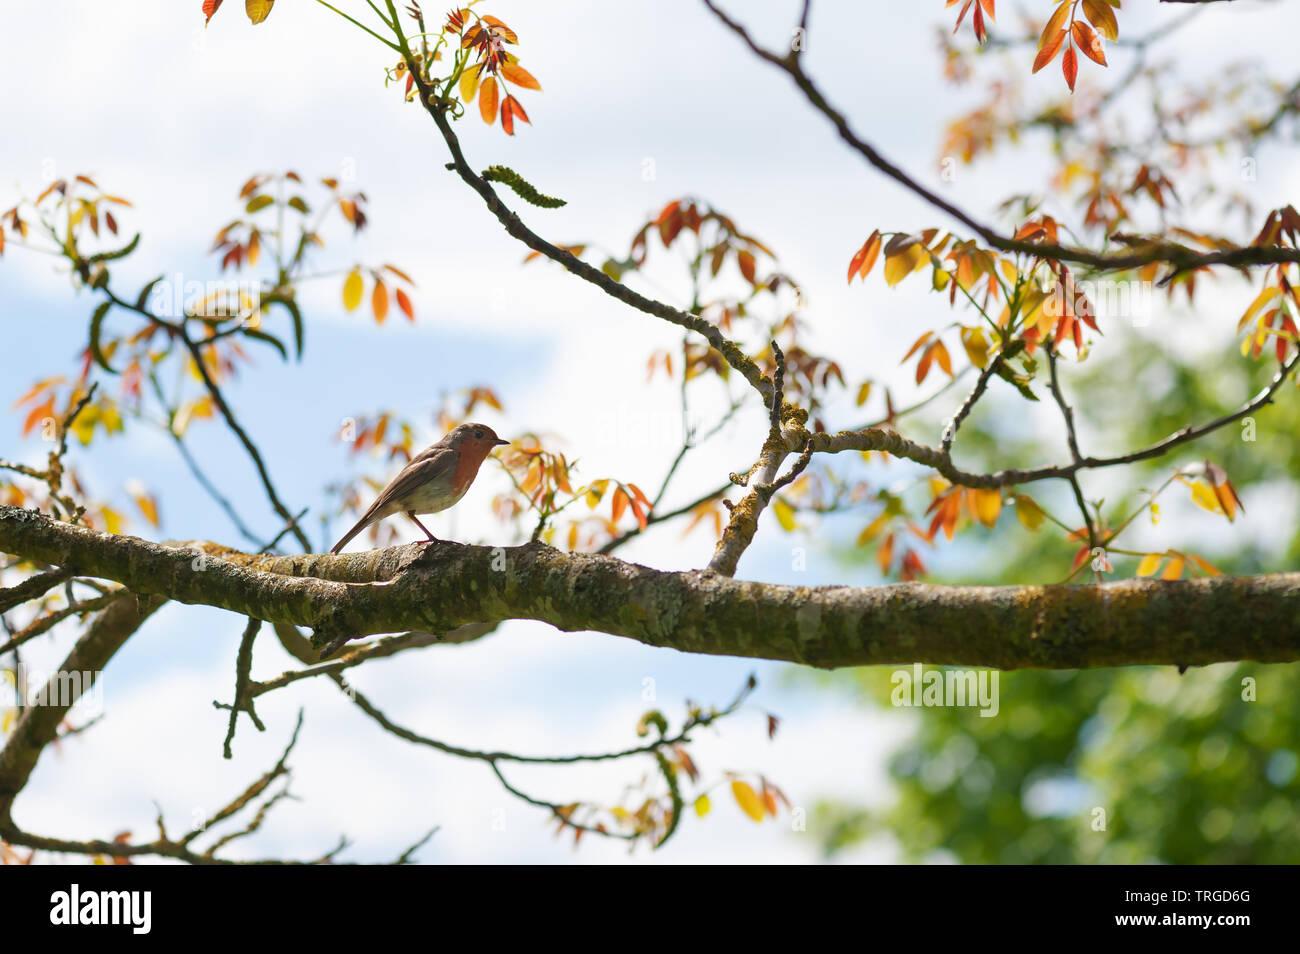 Robin in a walnut tree. - Stock Image